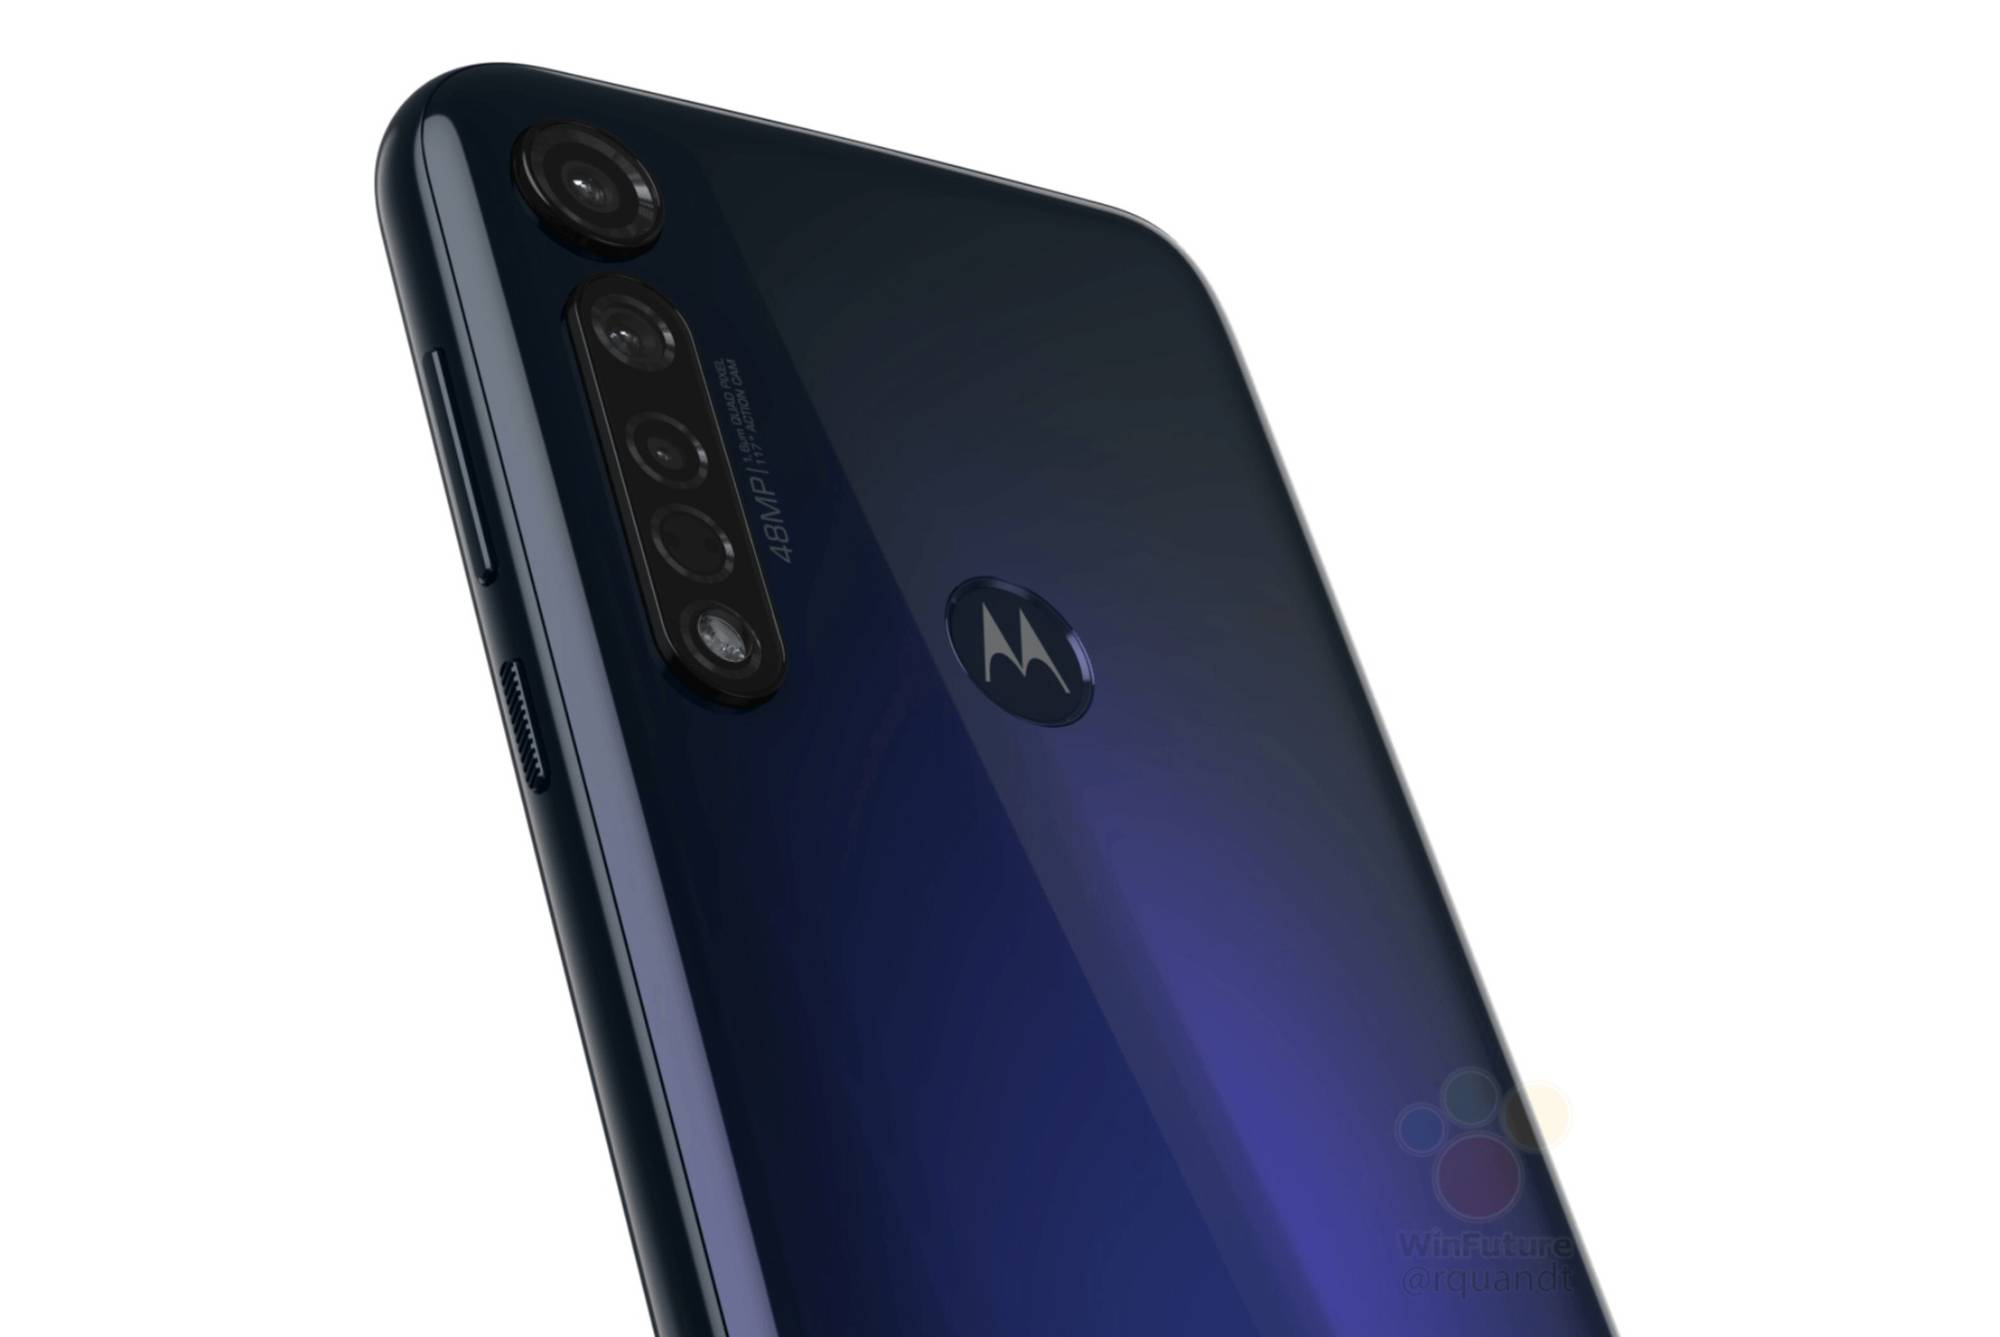 Neuster Smartphone-Leak zeigt das Motorola Moto G8 Plus mit Datenblatt